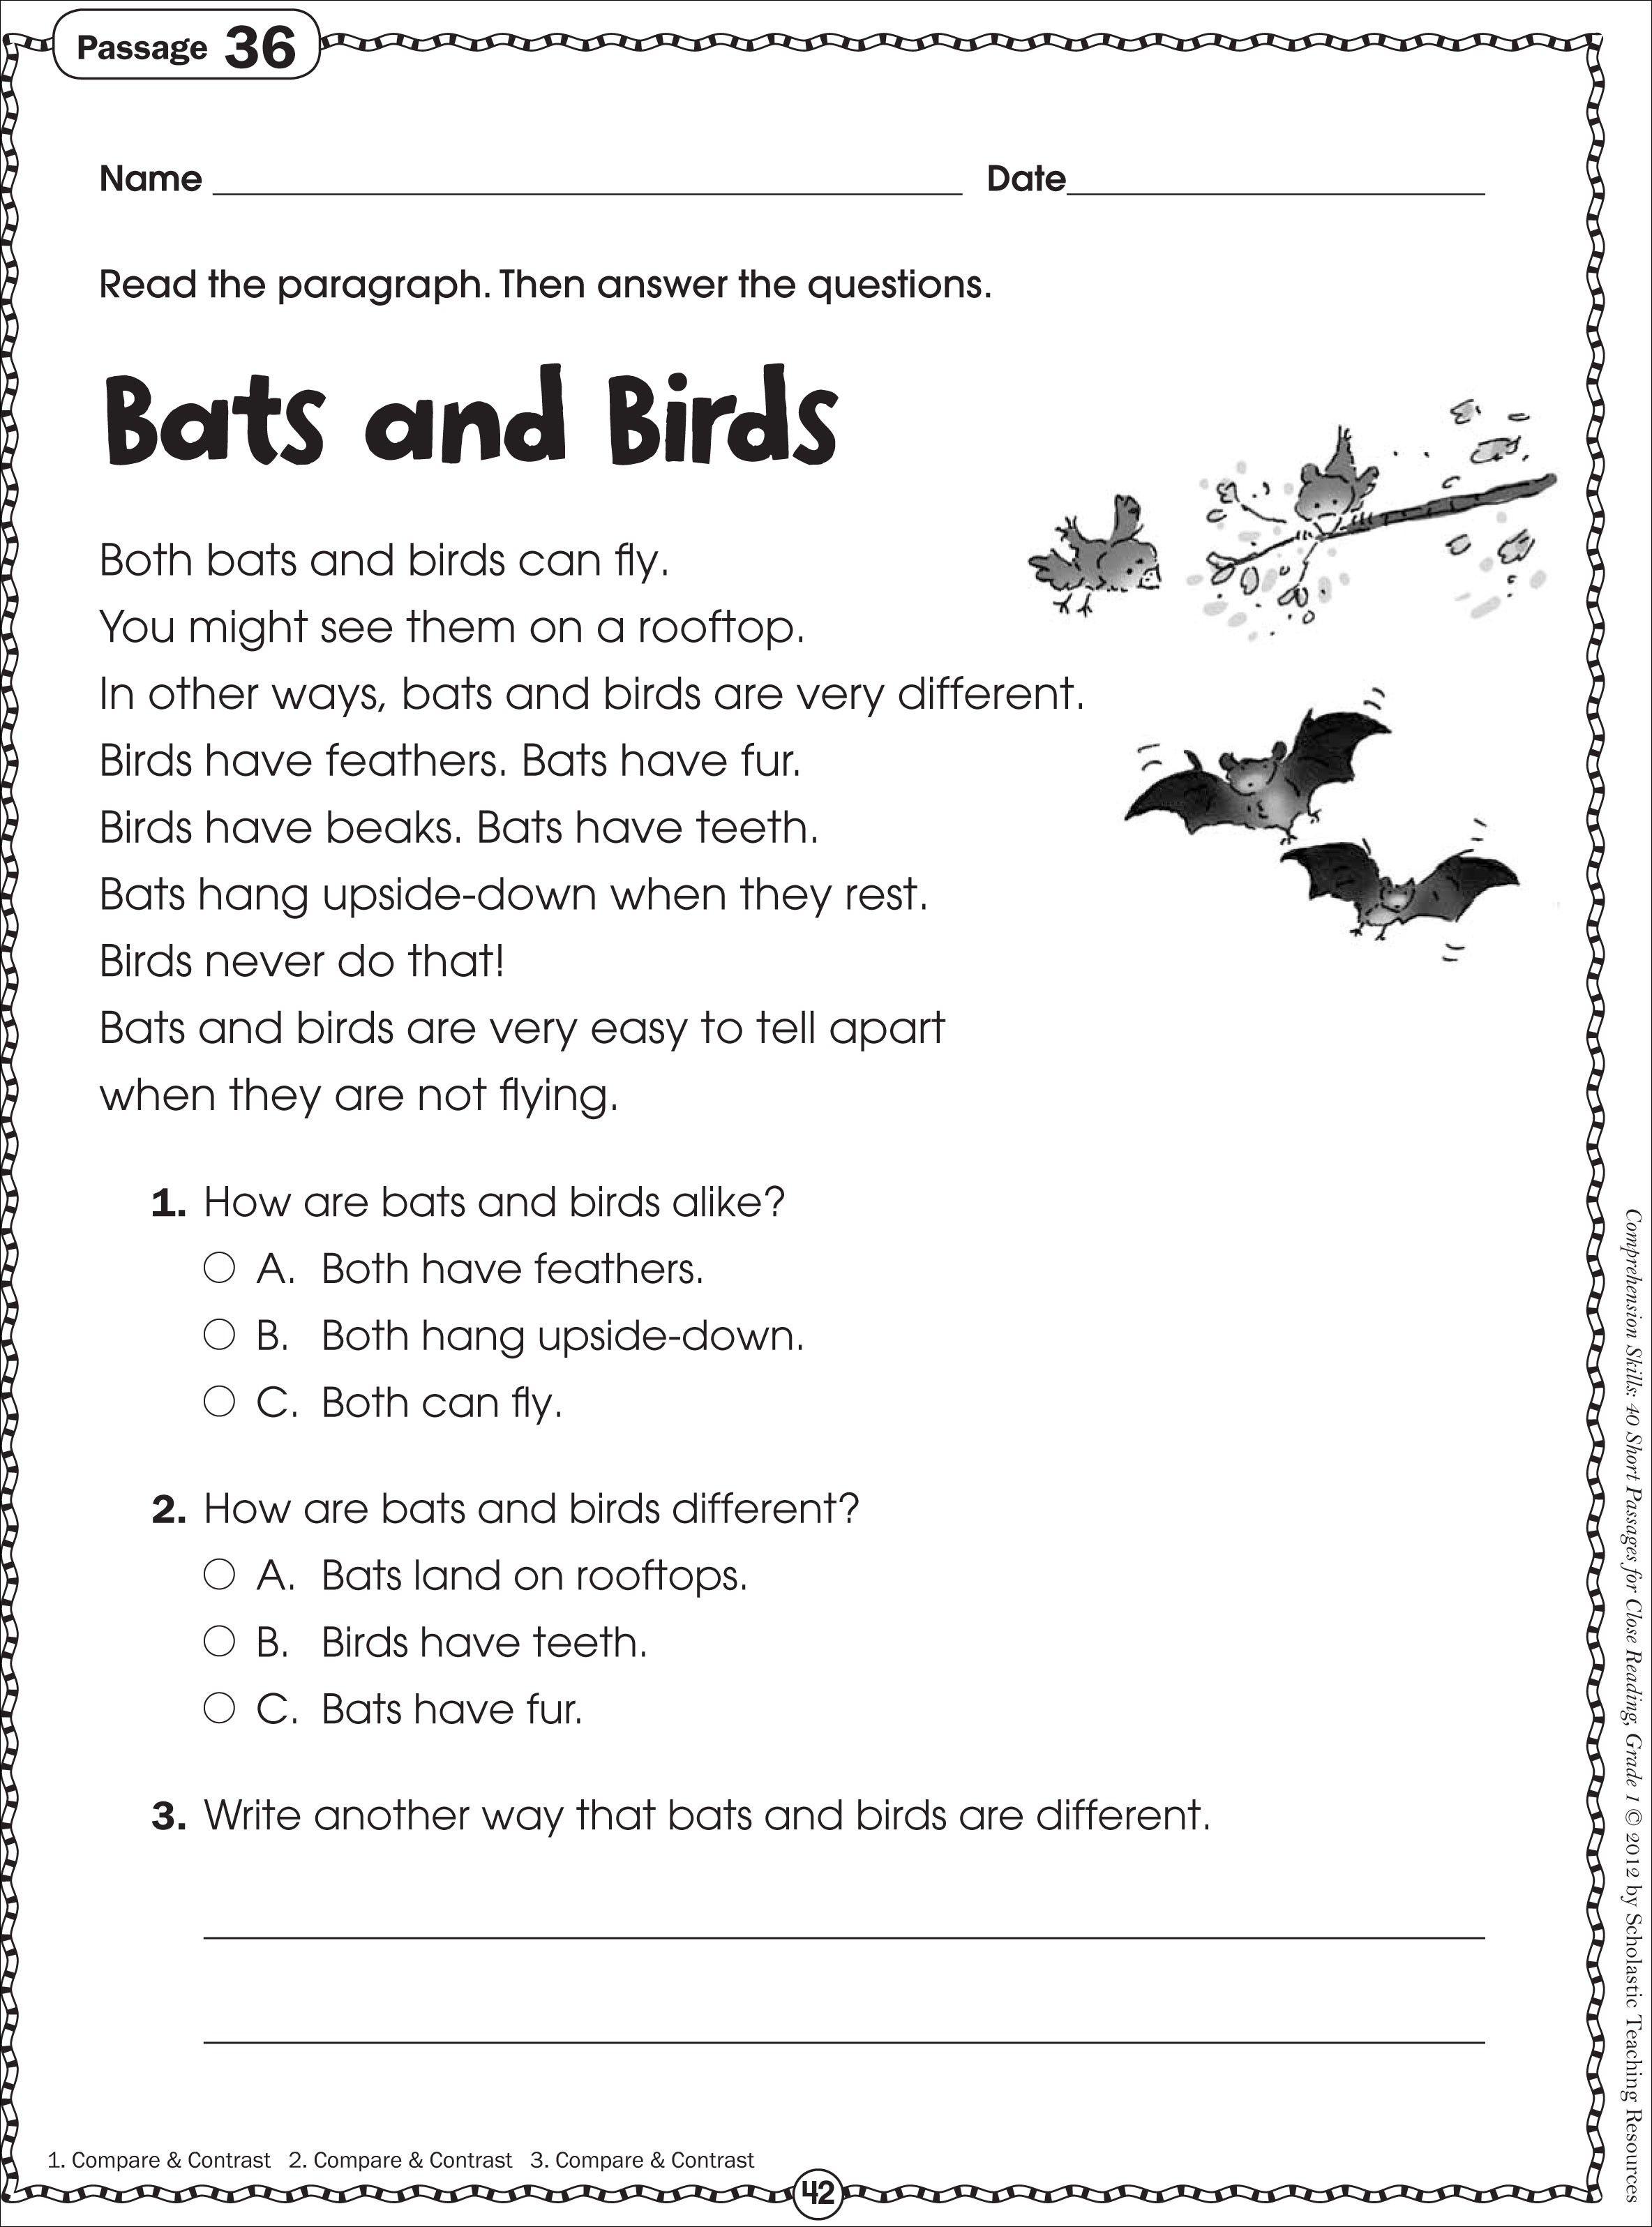 Free Printable Reading Comprehension Worksheets For Kindergarten - Free Printable Grade 1 Reading Comprehension Worksheets